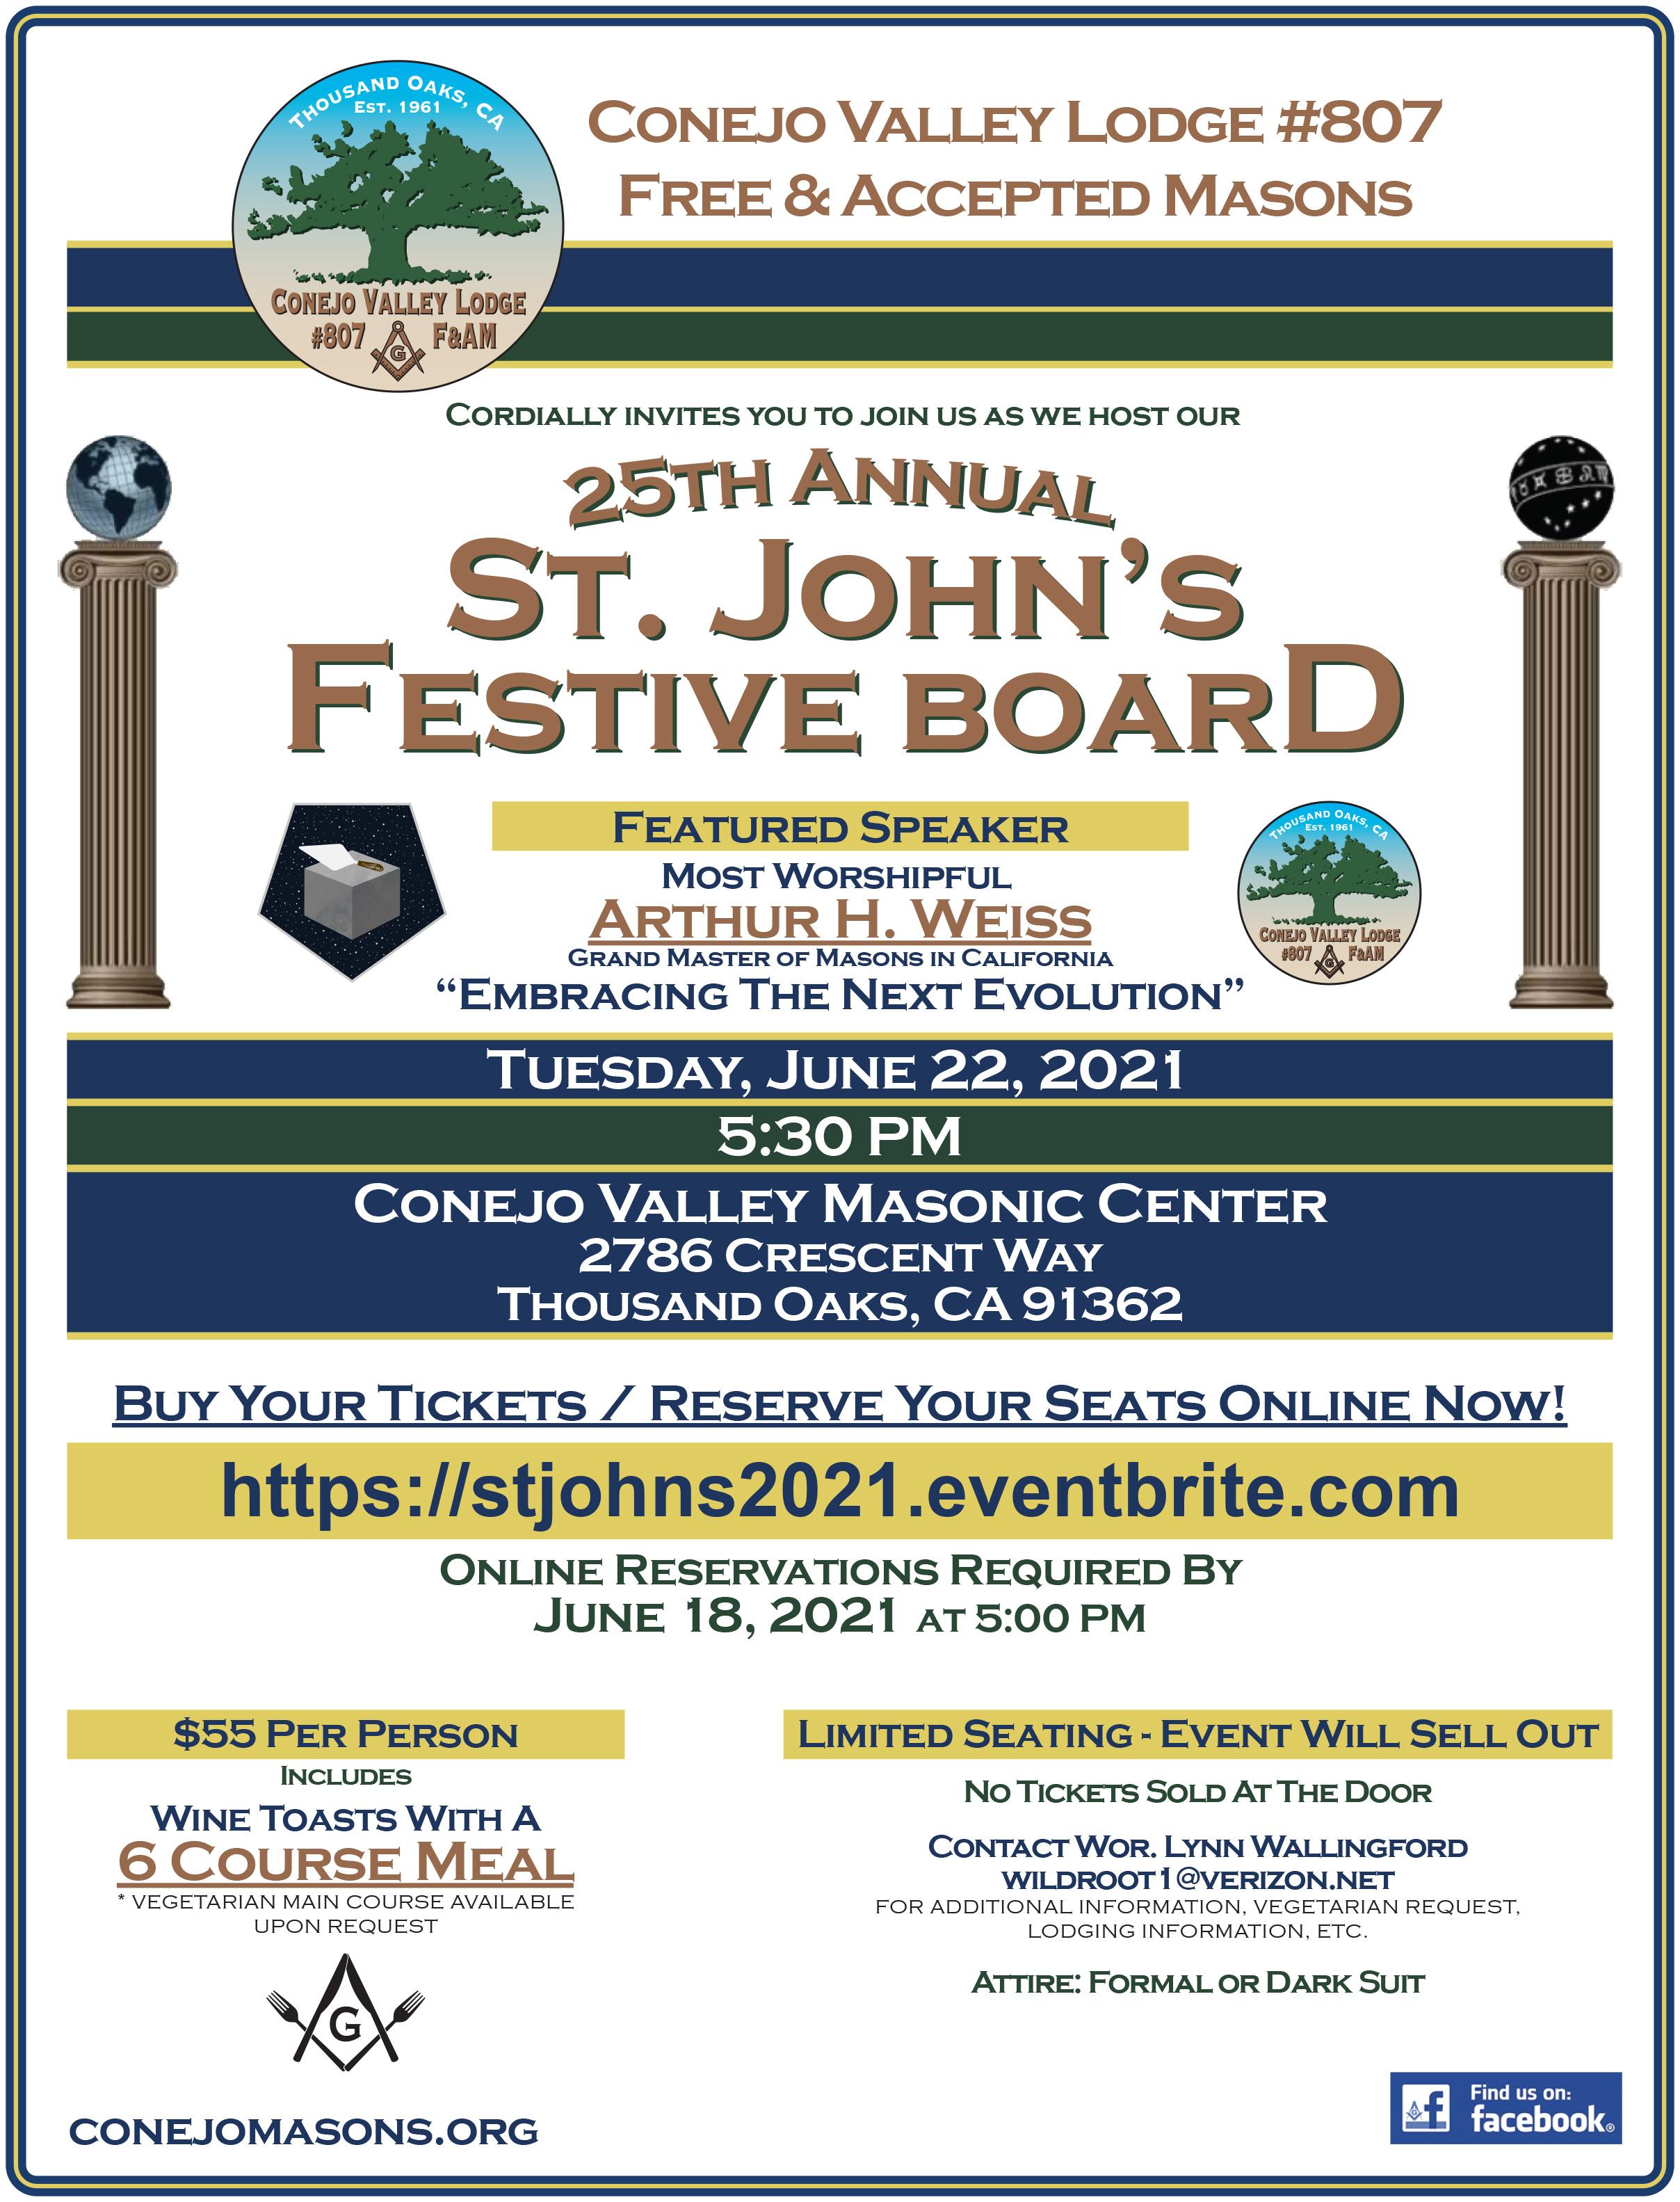 St. John's Festive Board 2021's photo'